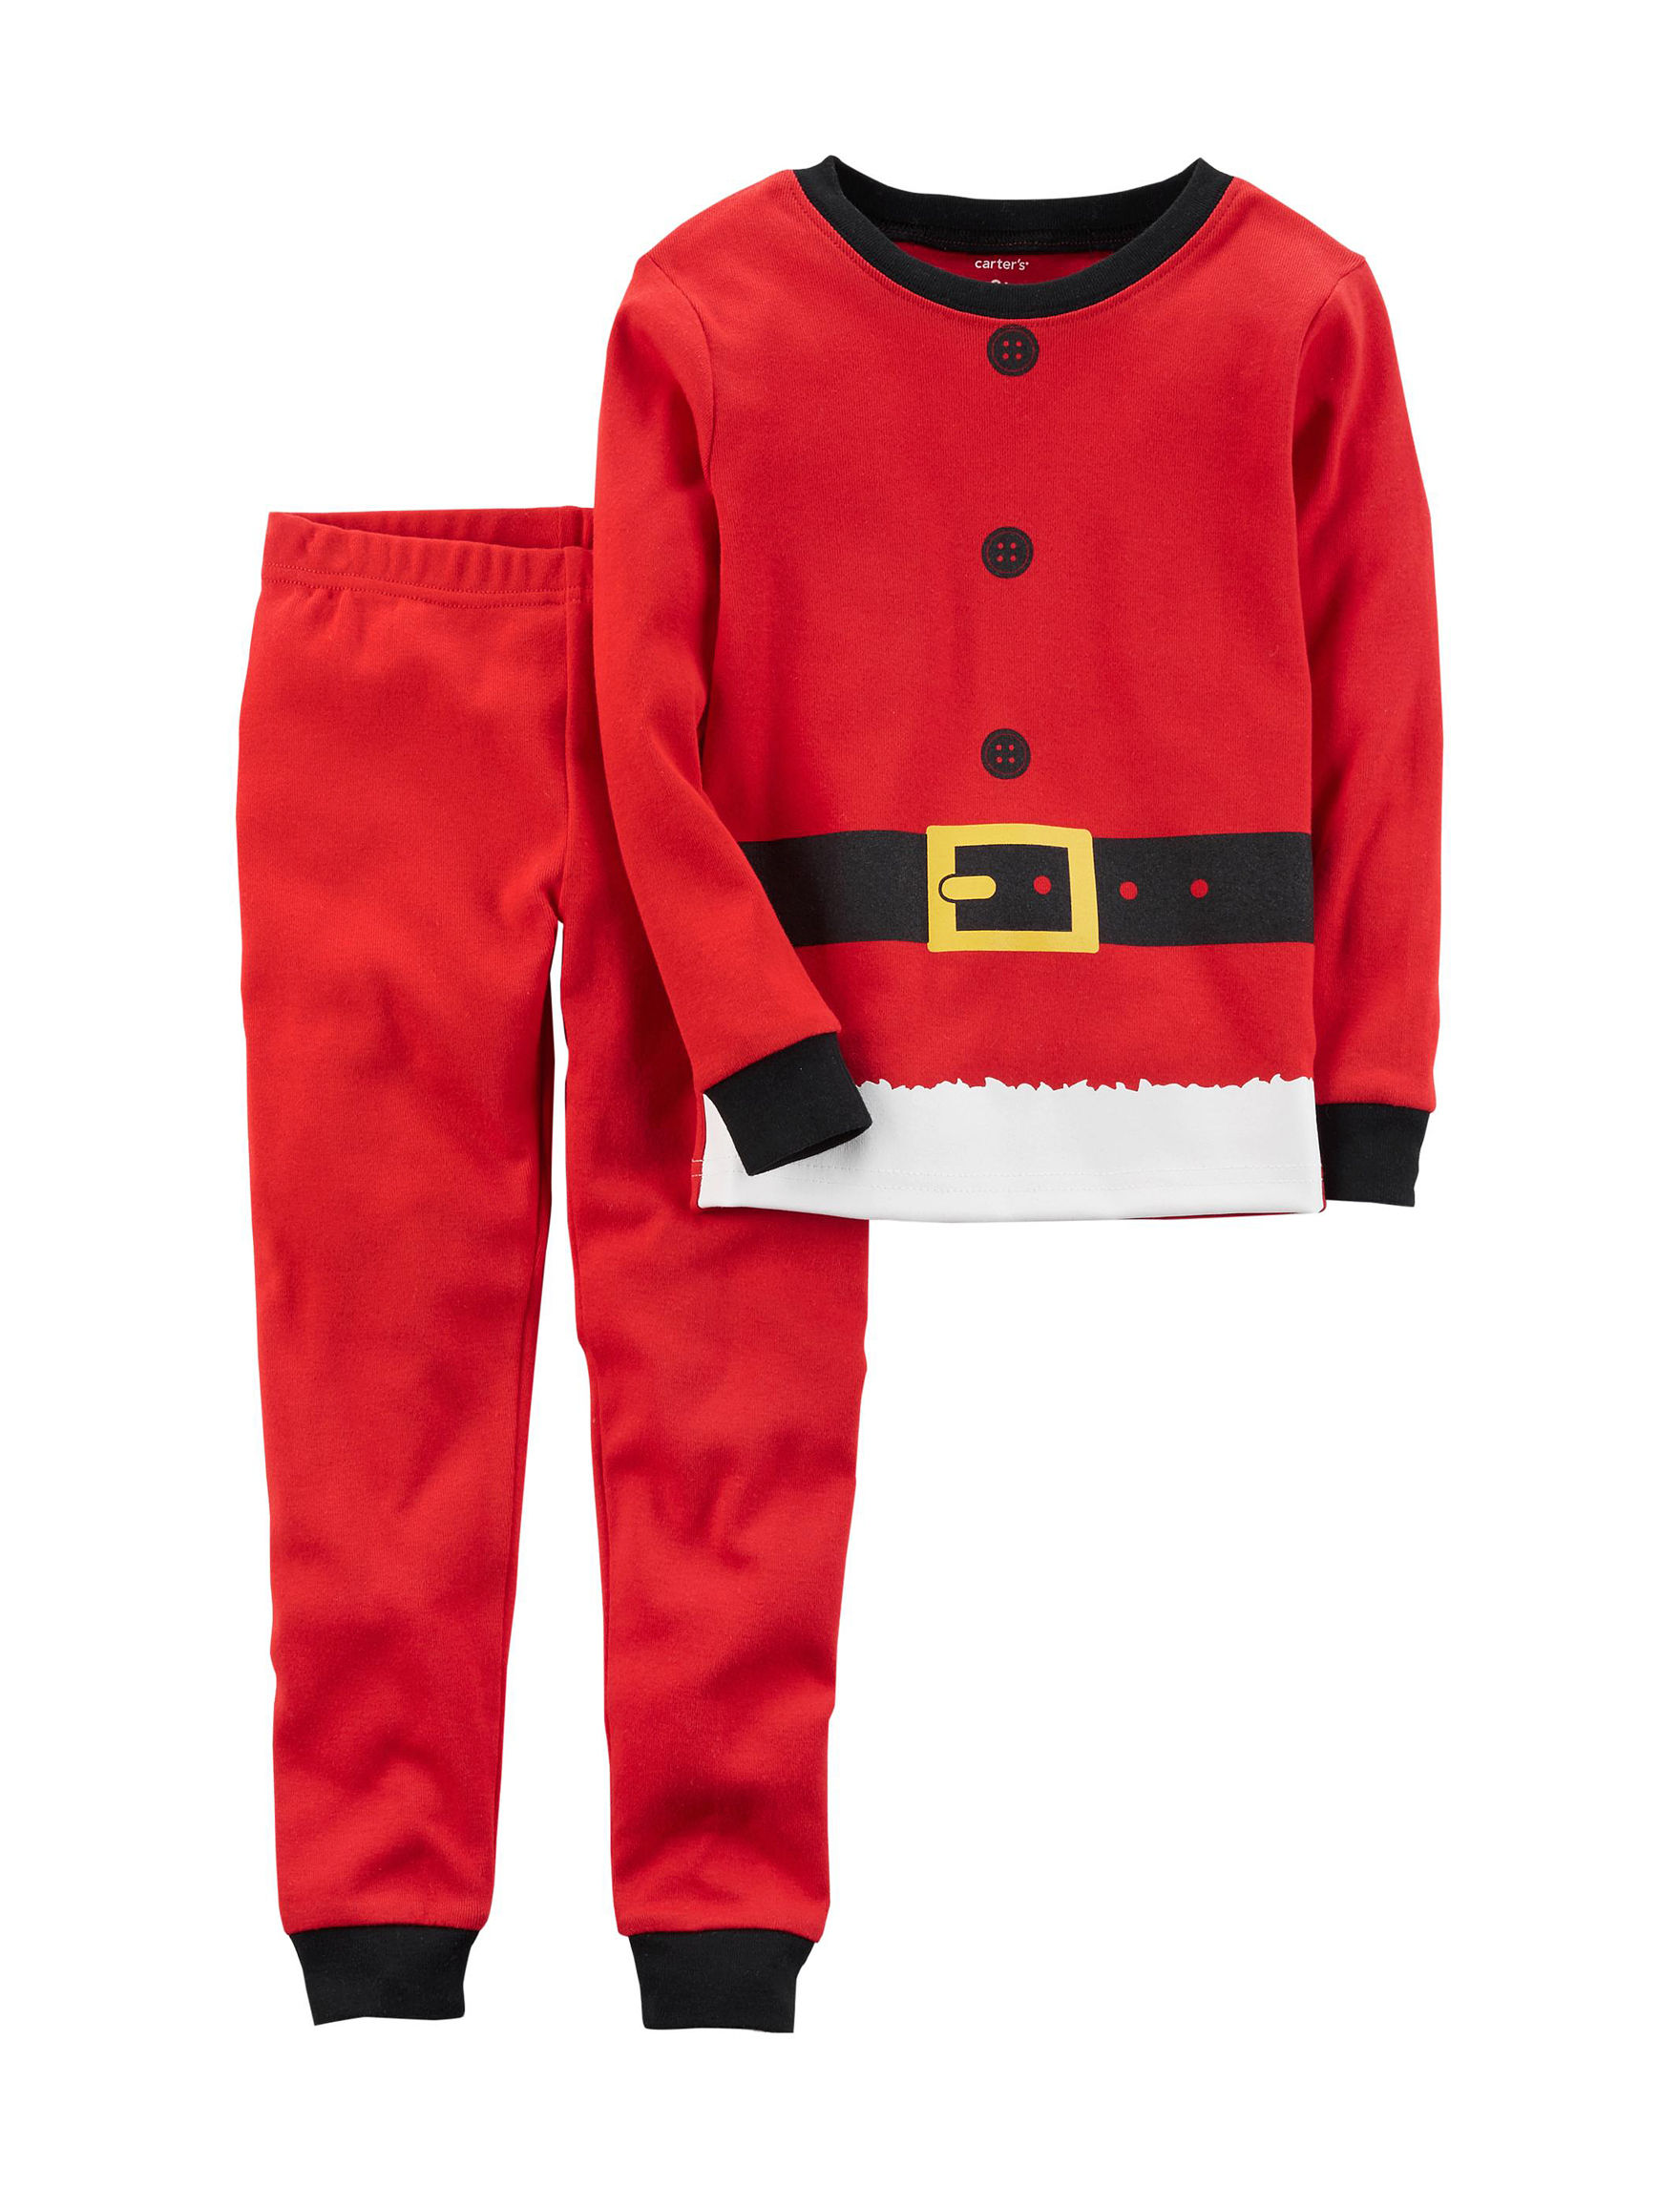 Carter's Red Pajama Sets